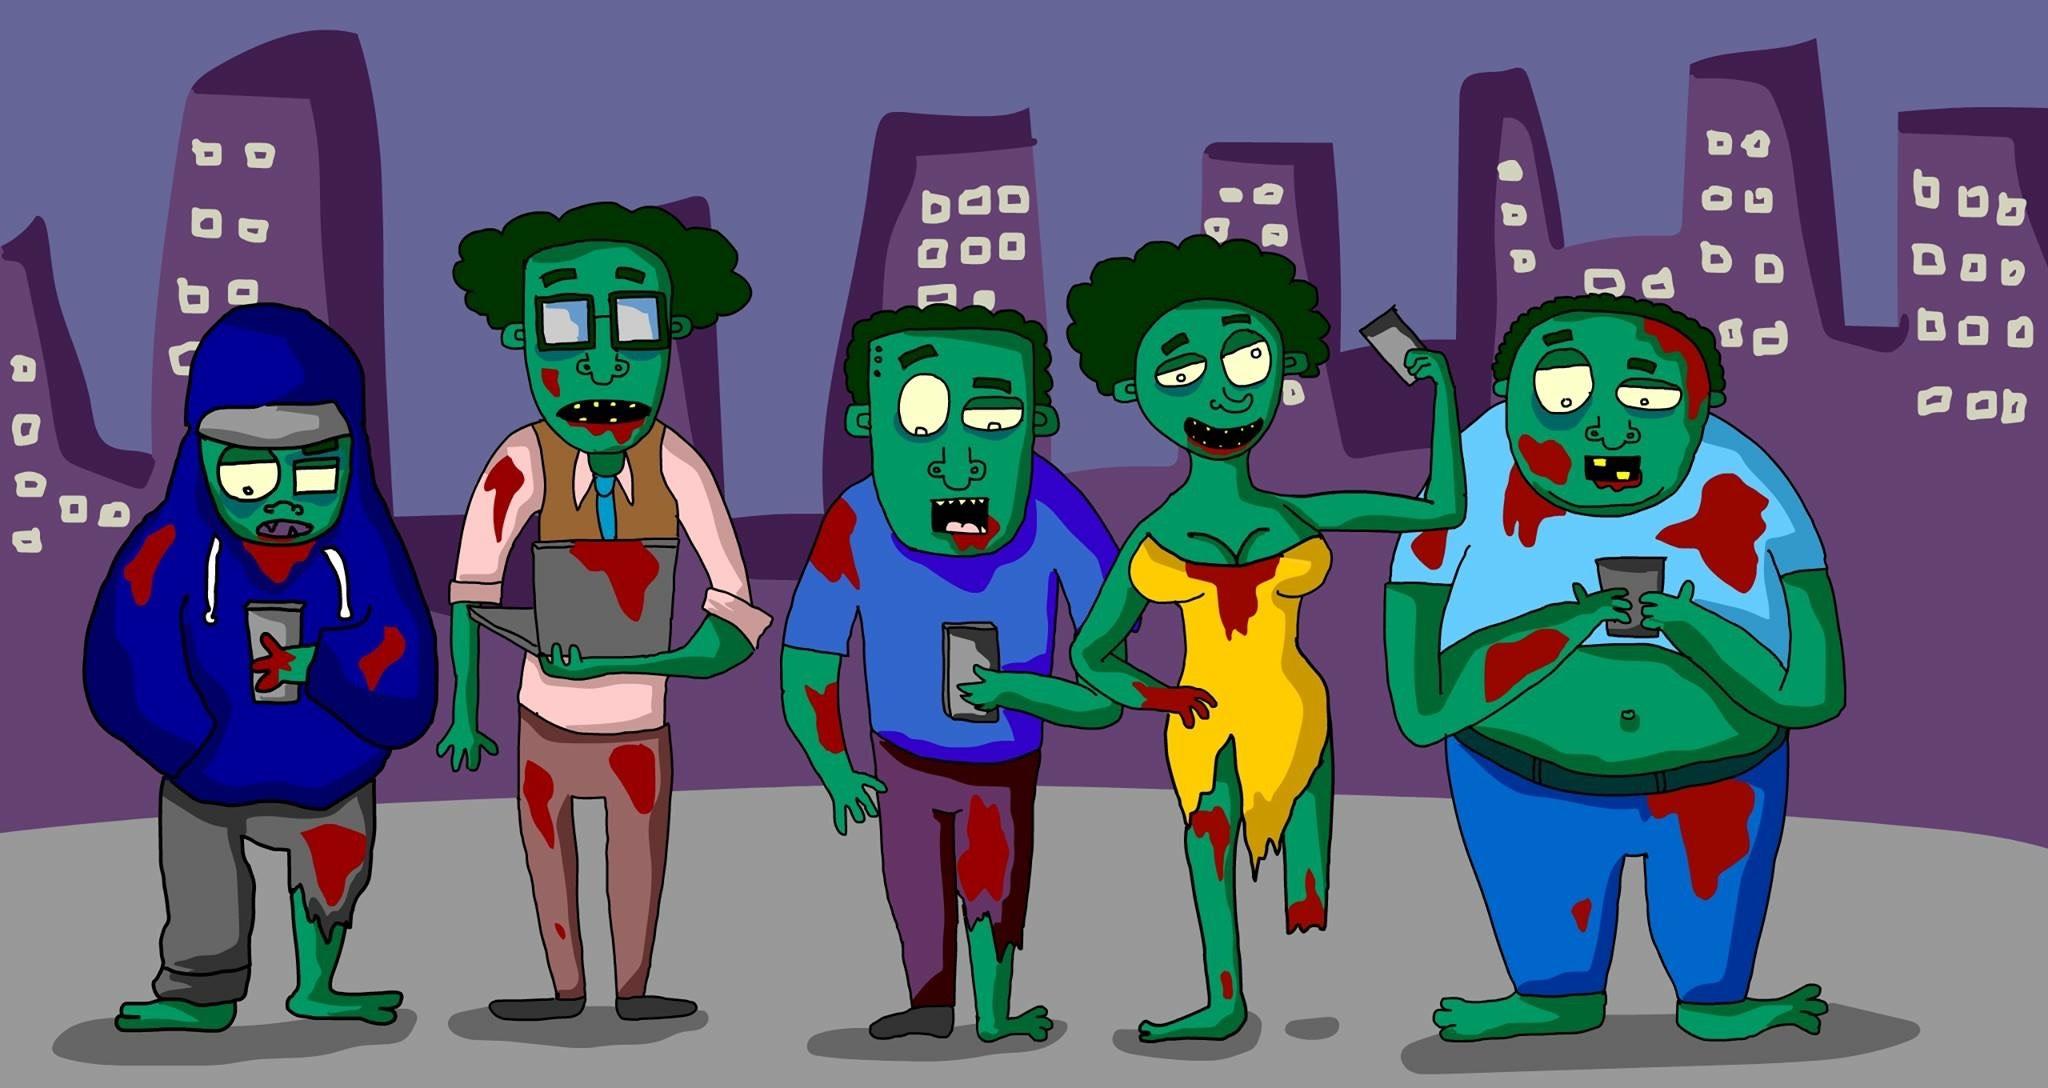 Social Media Zombies by Comfort Arthur